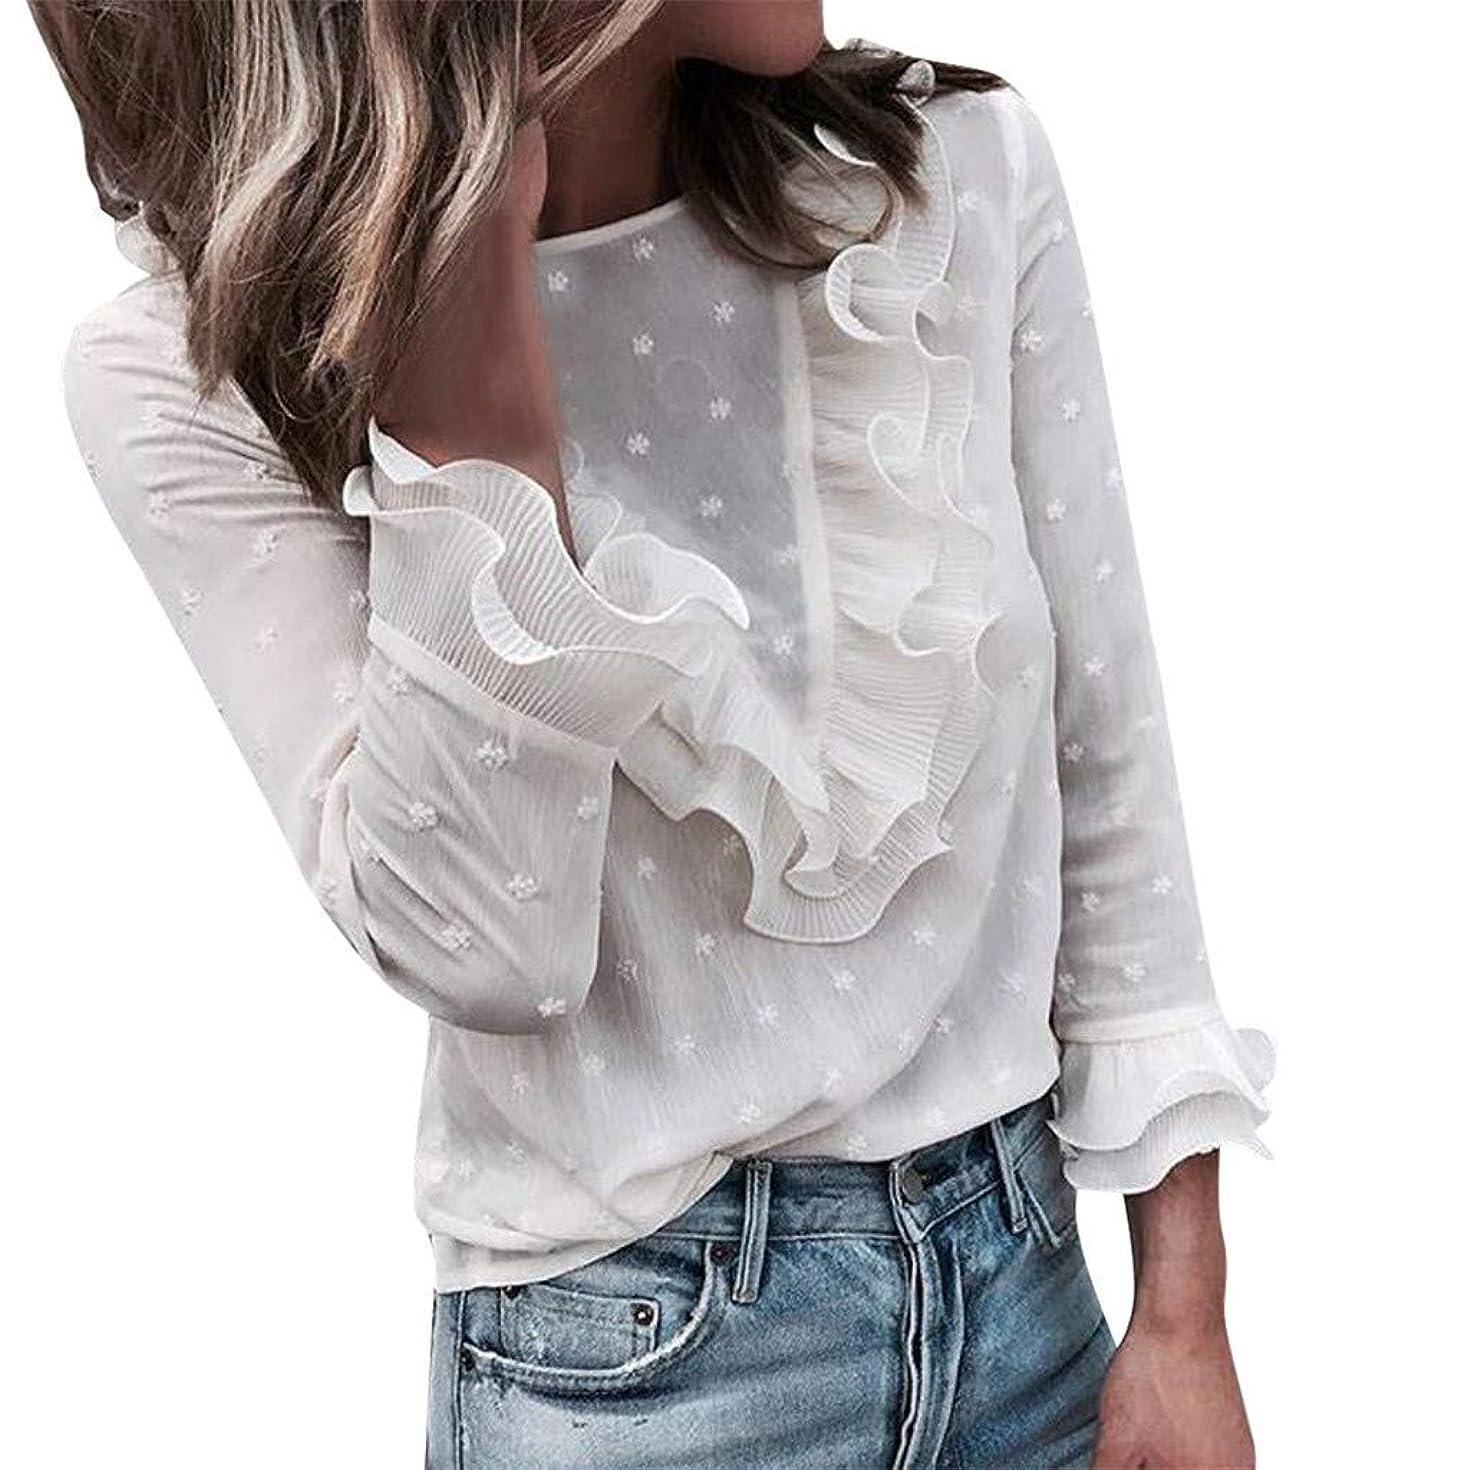 Sunhusing Ladies' Lace Polka Dot Print Round Neck Button Layered Ruffled Long Sleeve T-Shirt Top